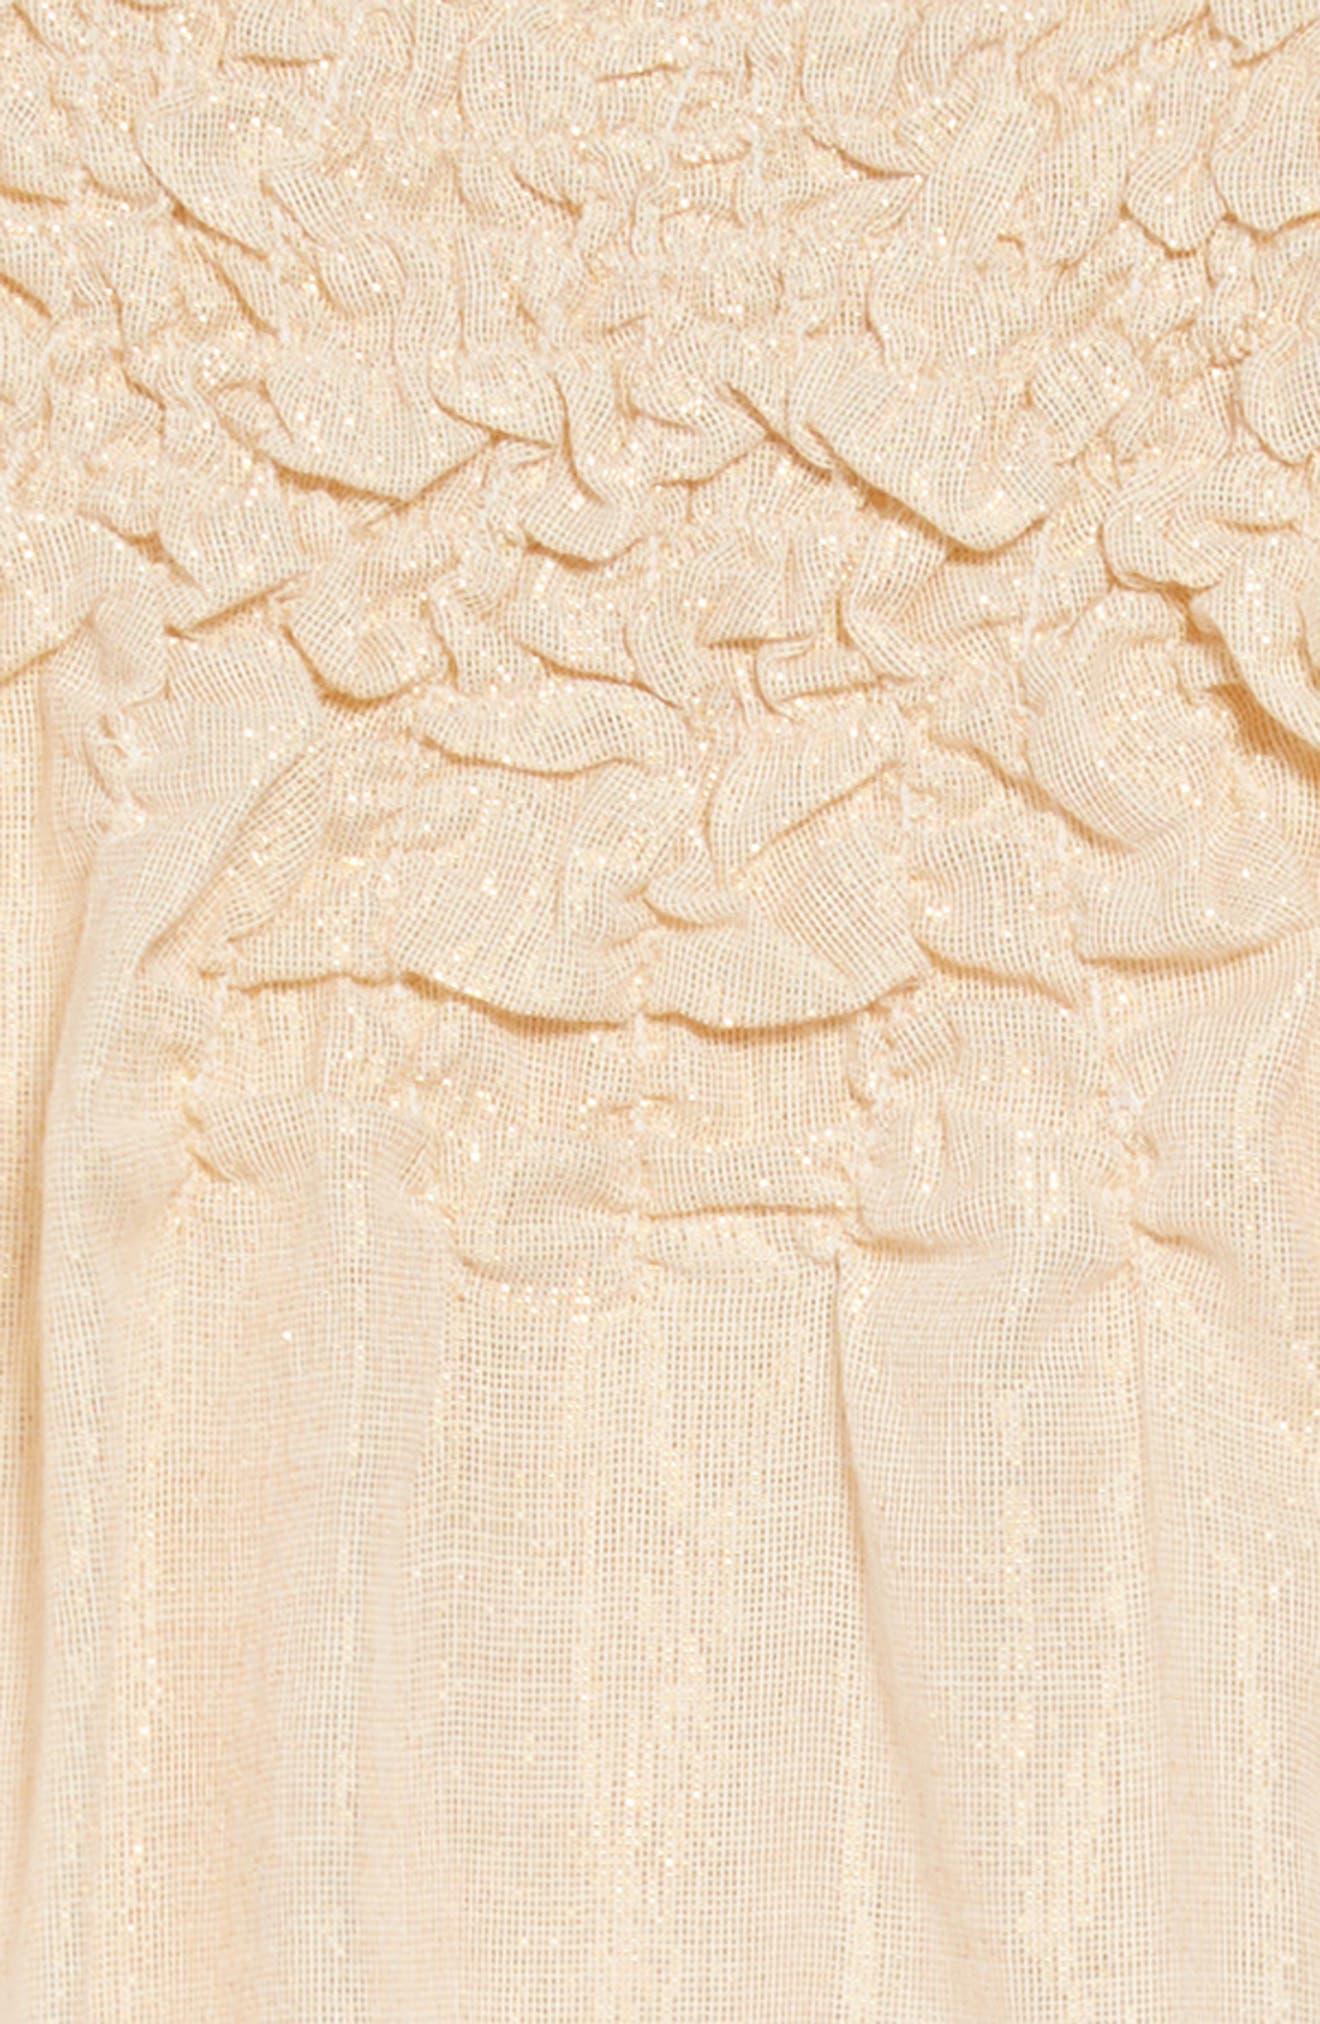 Rosie Sparkle Dress,                             Alternate thumbnail 3, color,                             METALLIC GOLD